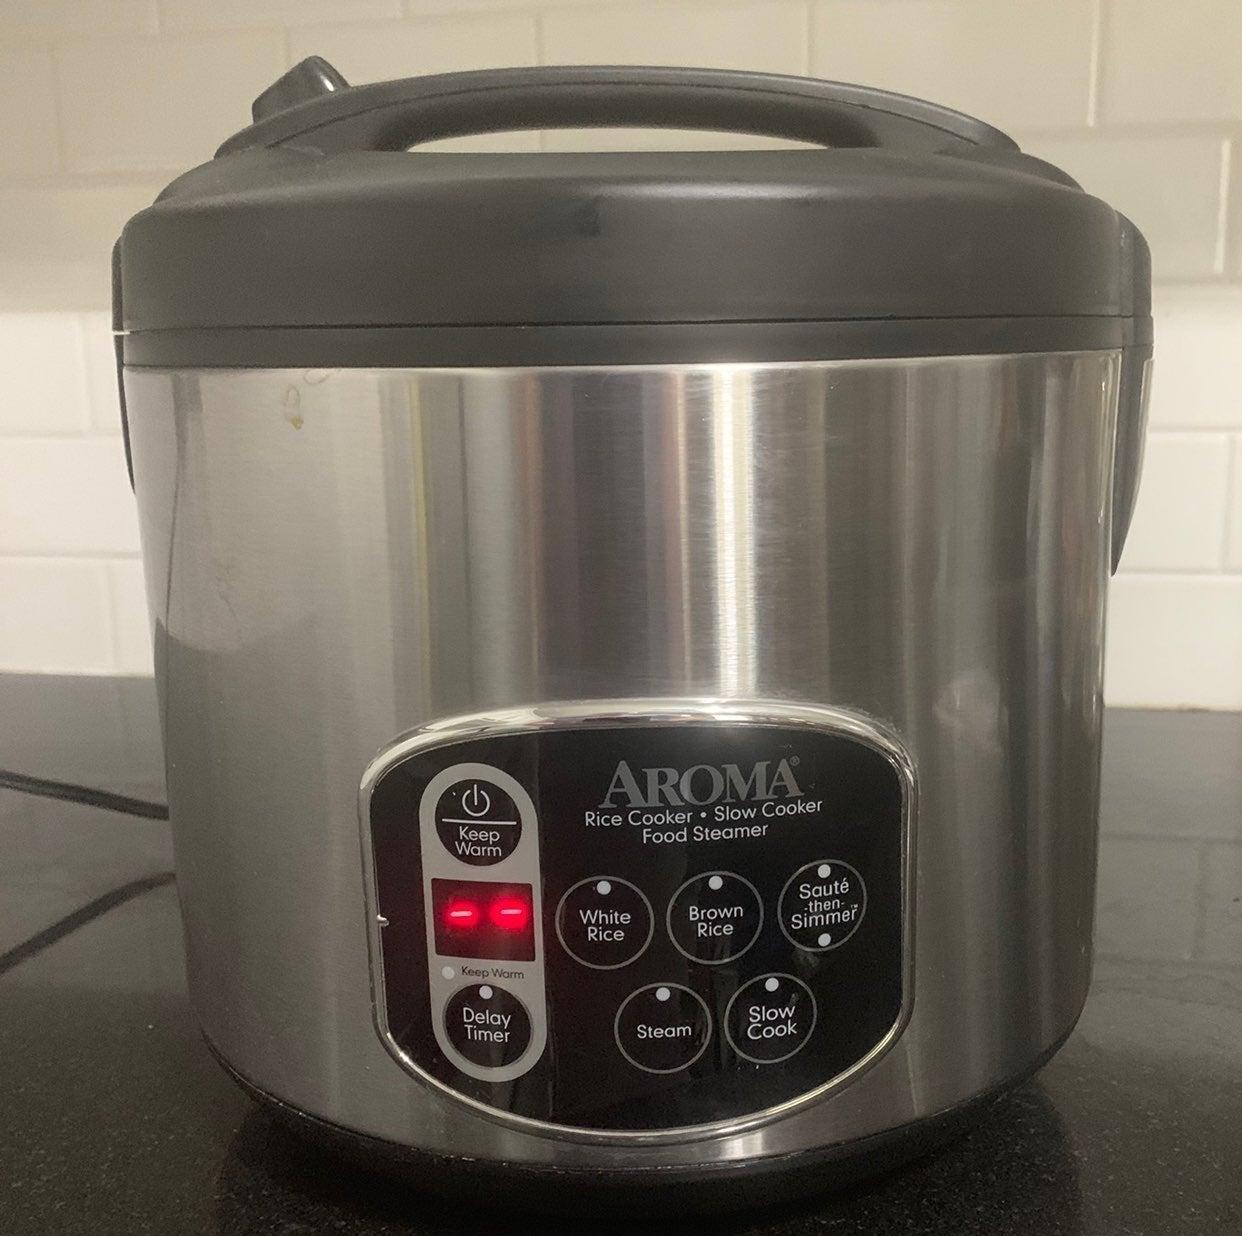 Aroma Rice Cooker Model ARC-1030SB